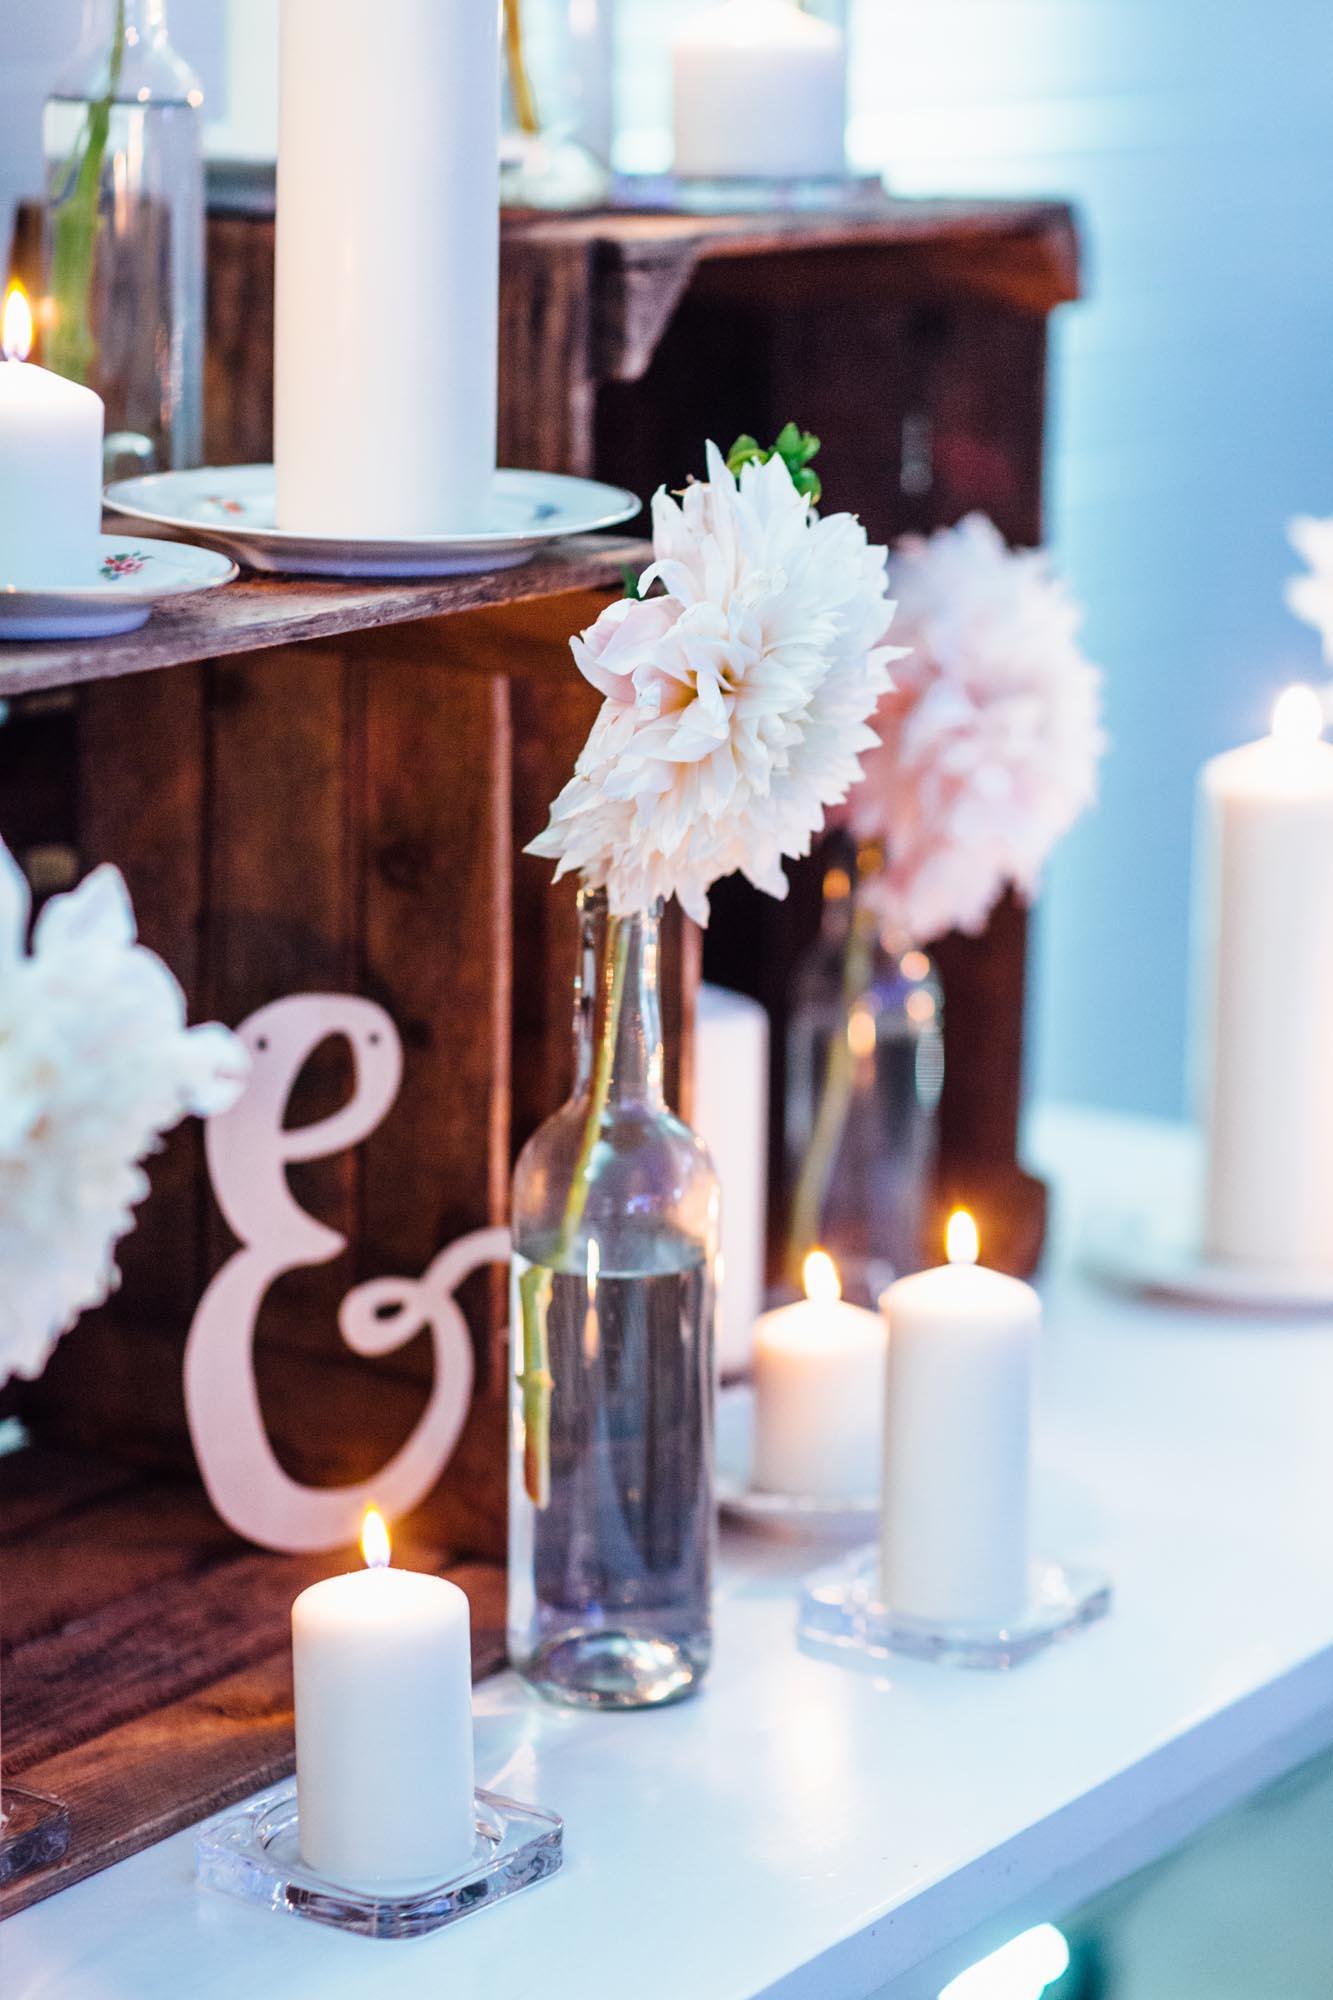 mariage voyage le comptoir du bonheur by vincelie. Black Bedroom Furniture Sets. Home Design Ideas